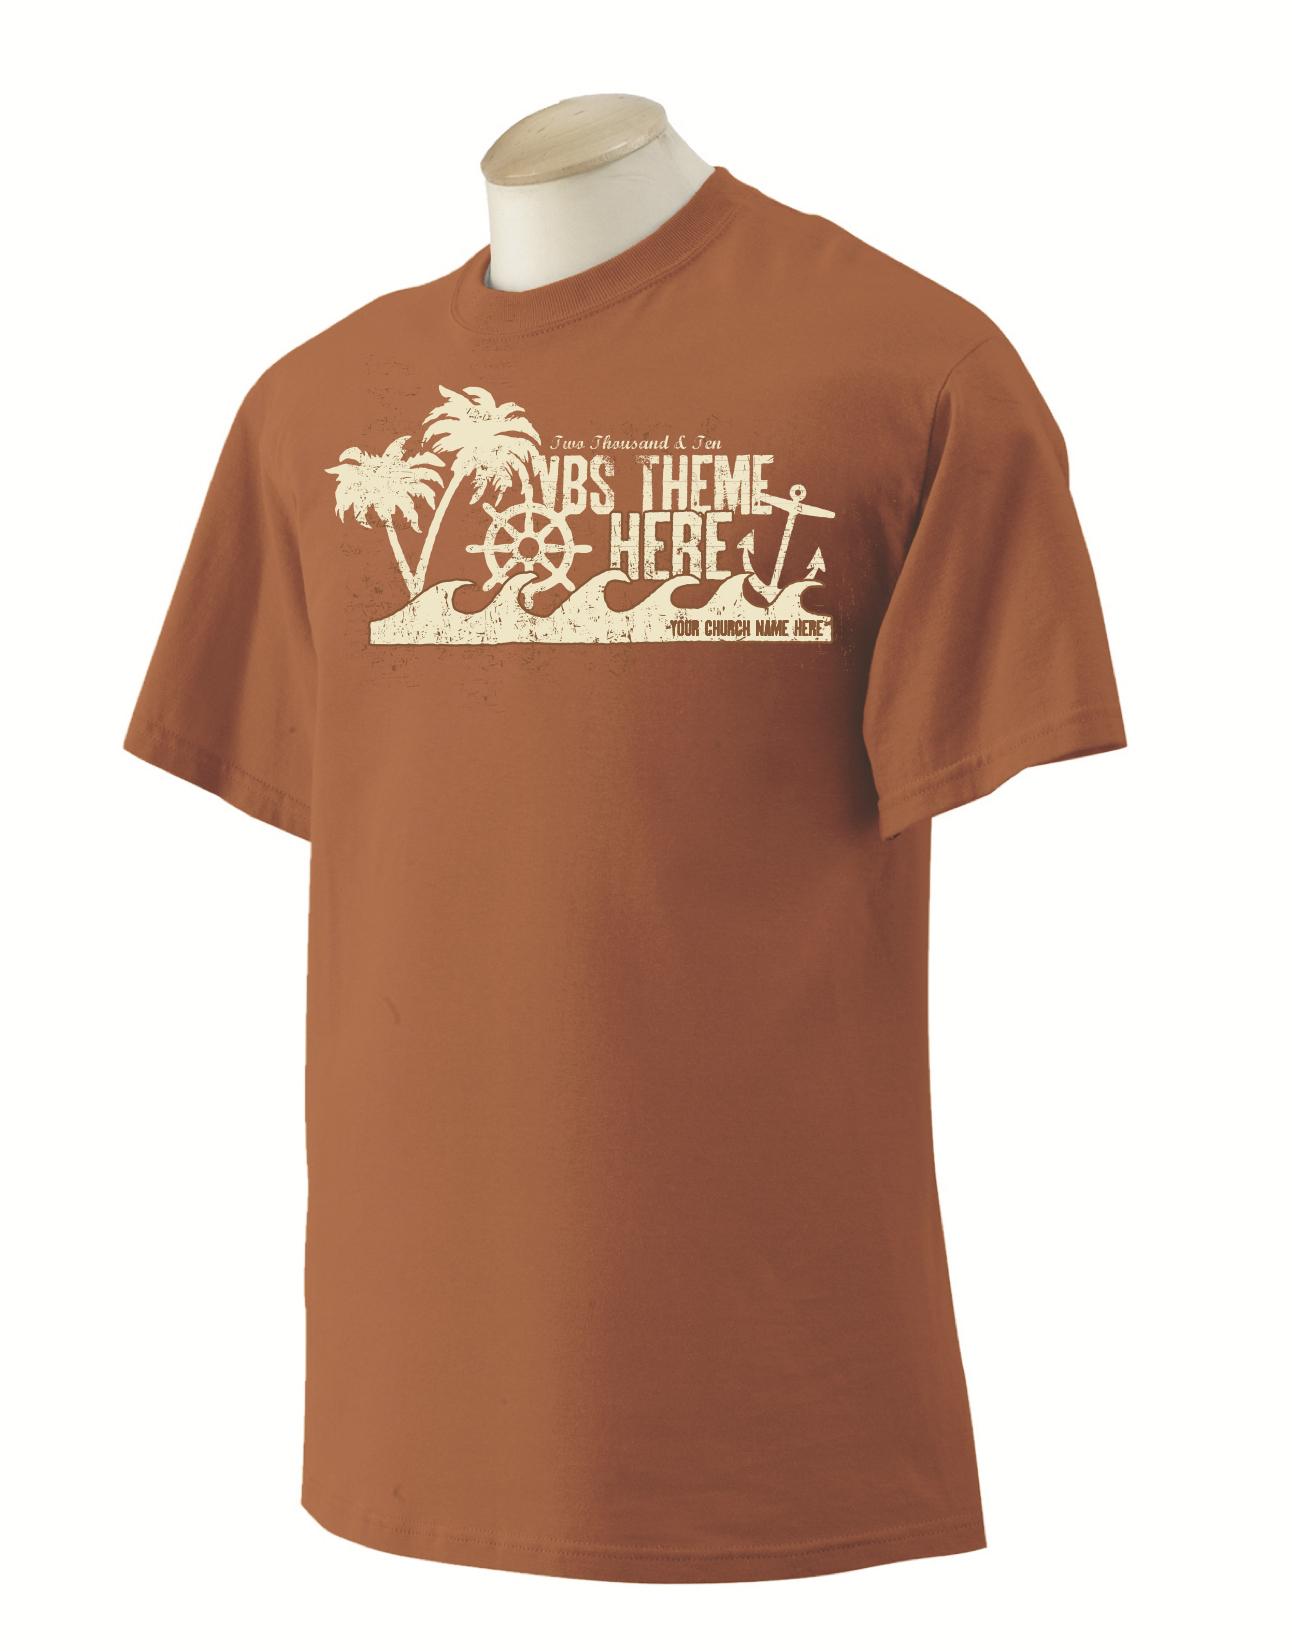 ocean 1 texas orange shirt.jpg